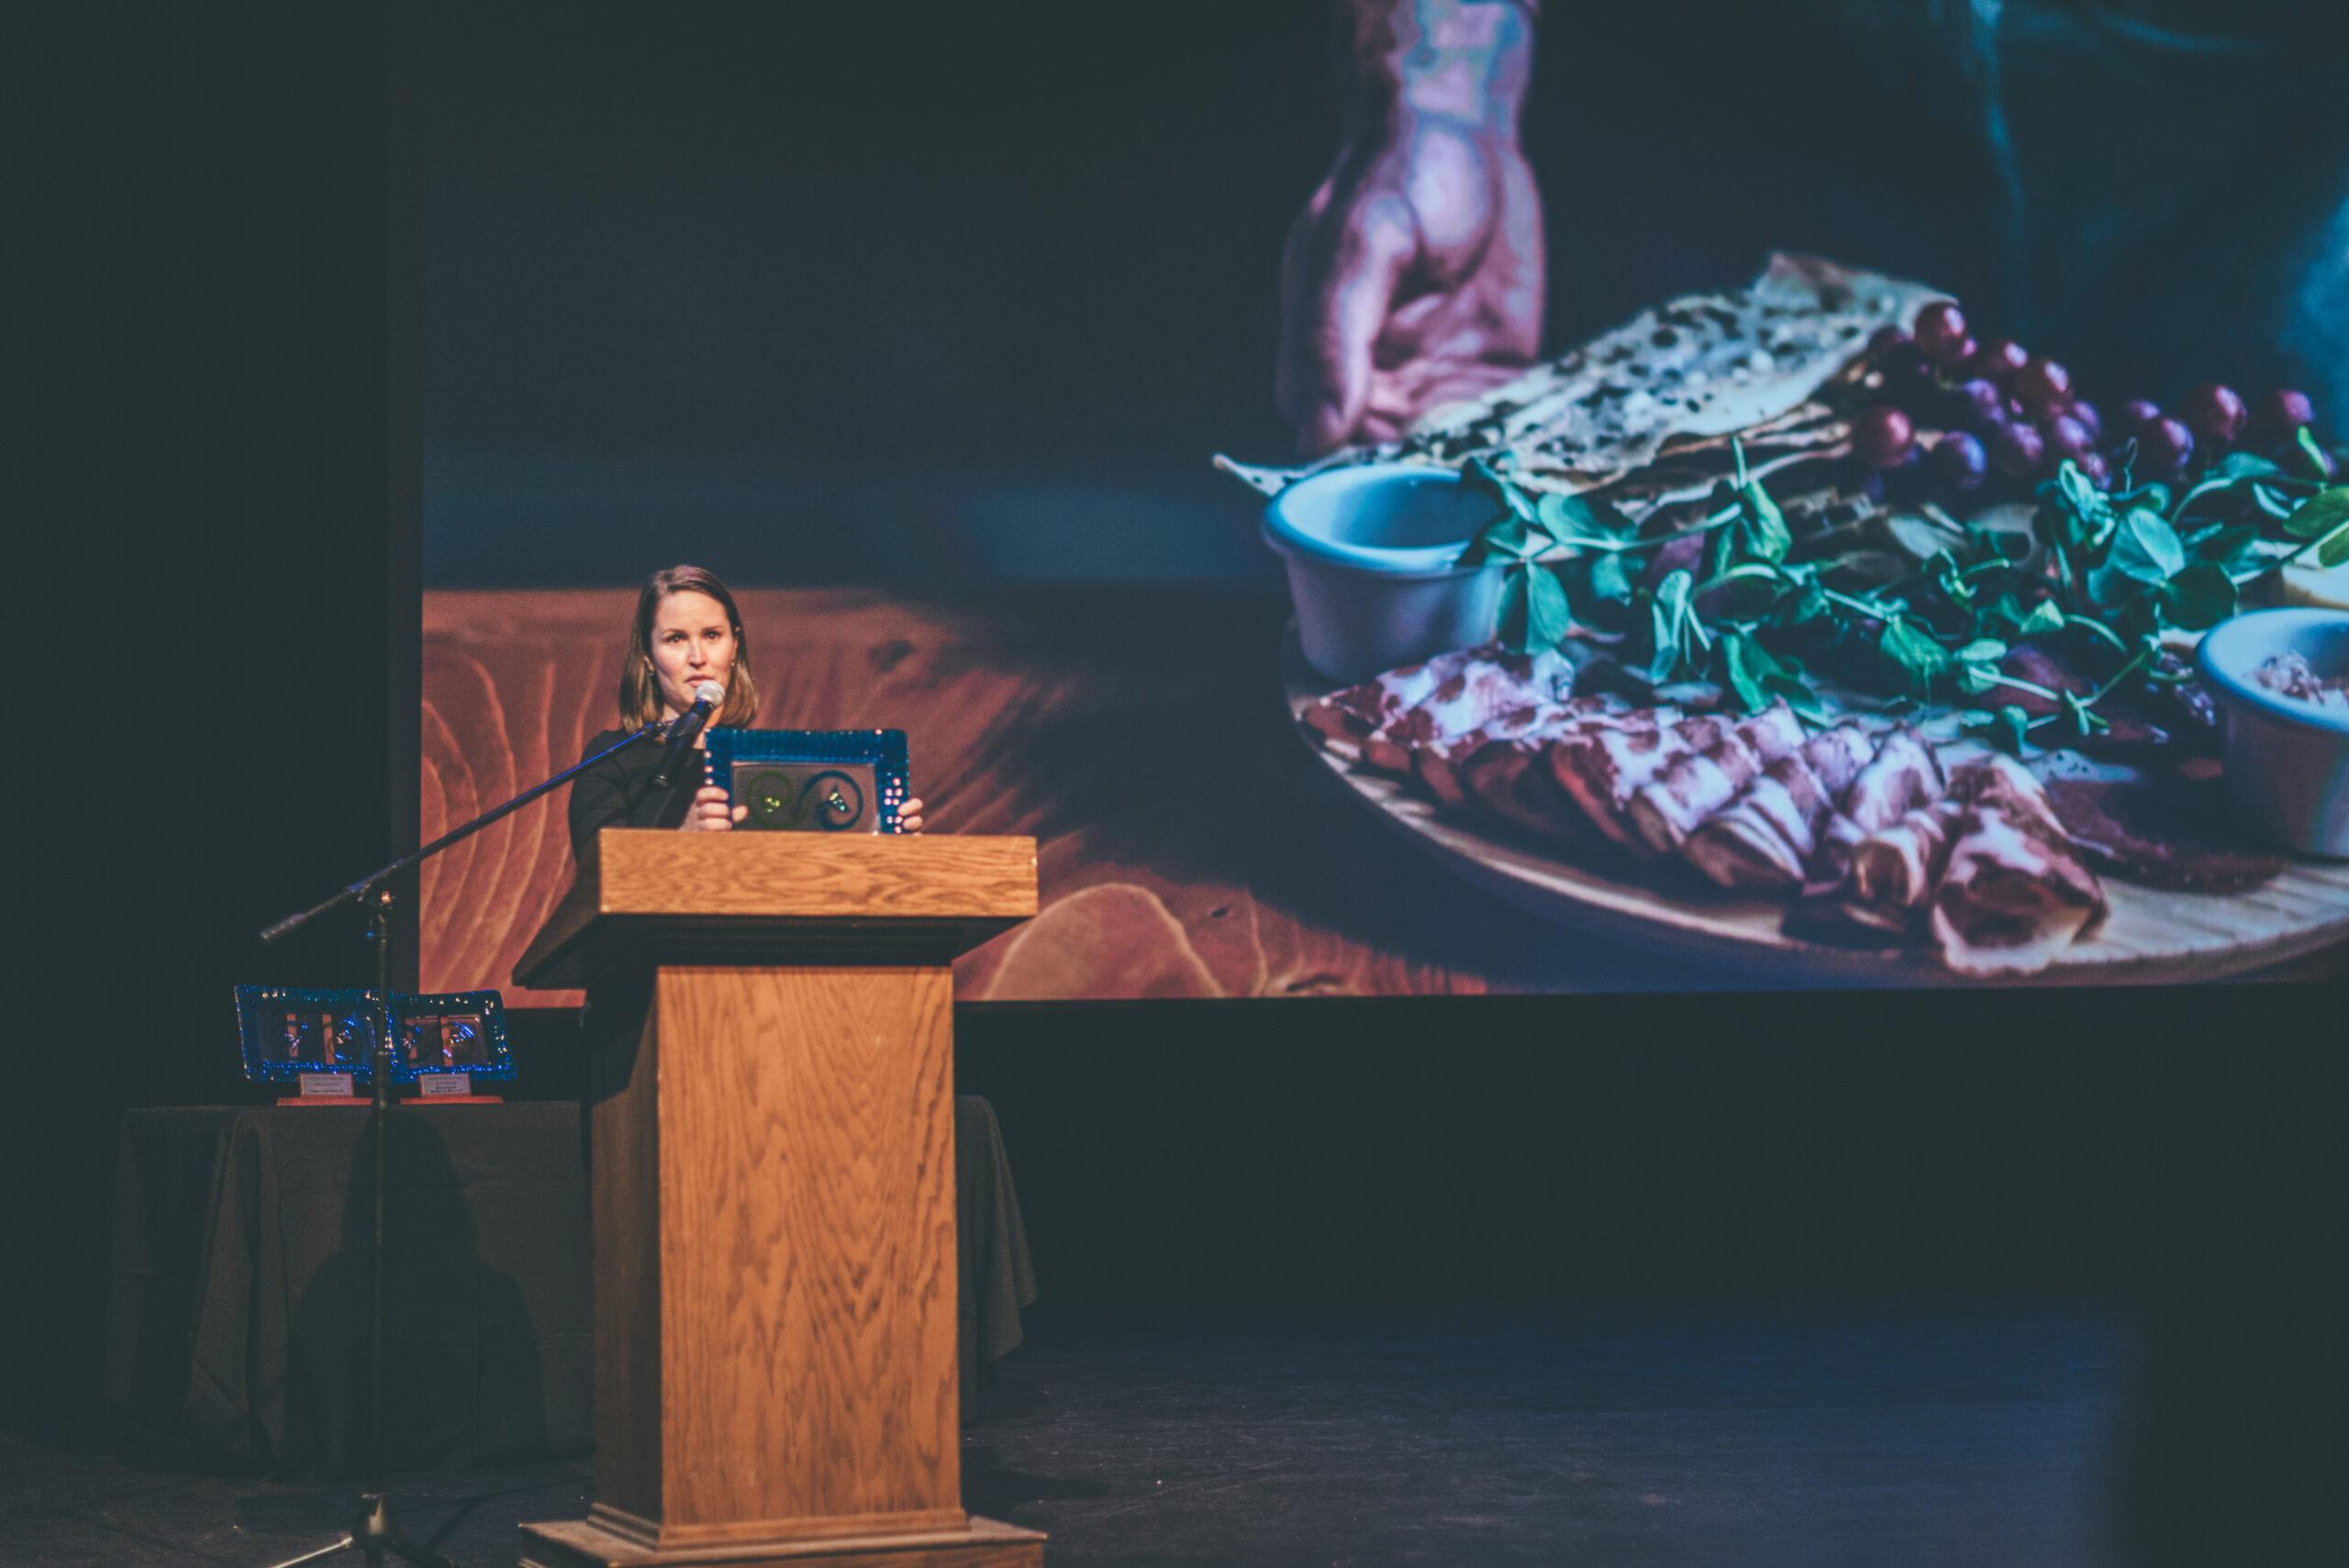 Taste of Nova Scotia Awards Presentation & Reception - IN PERSON